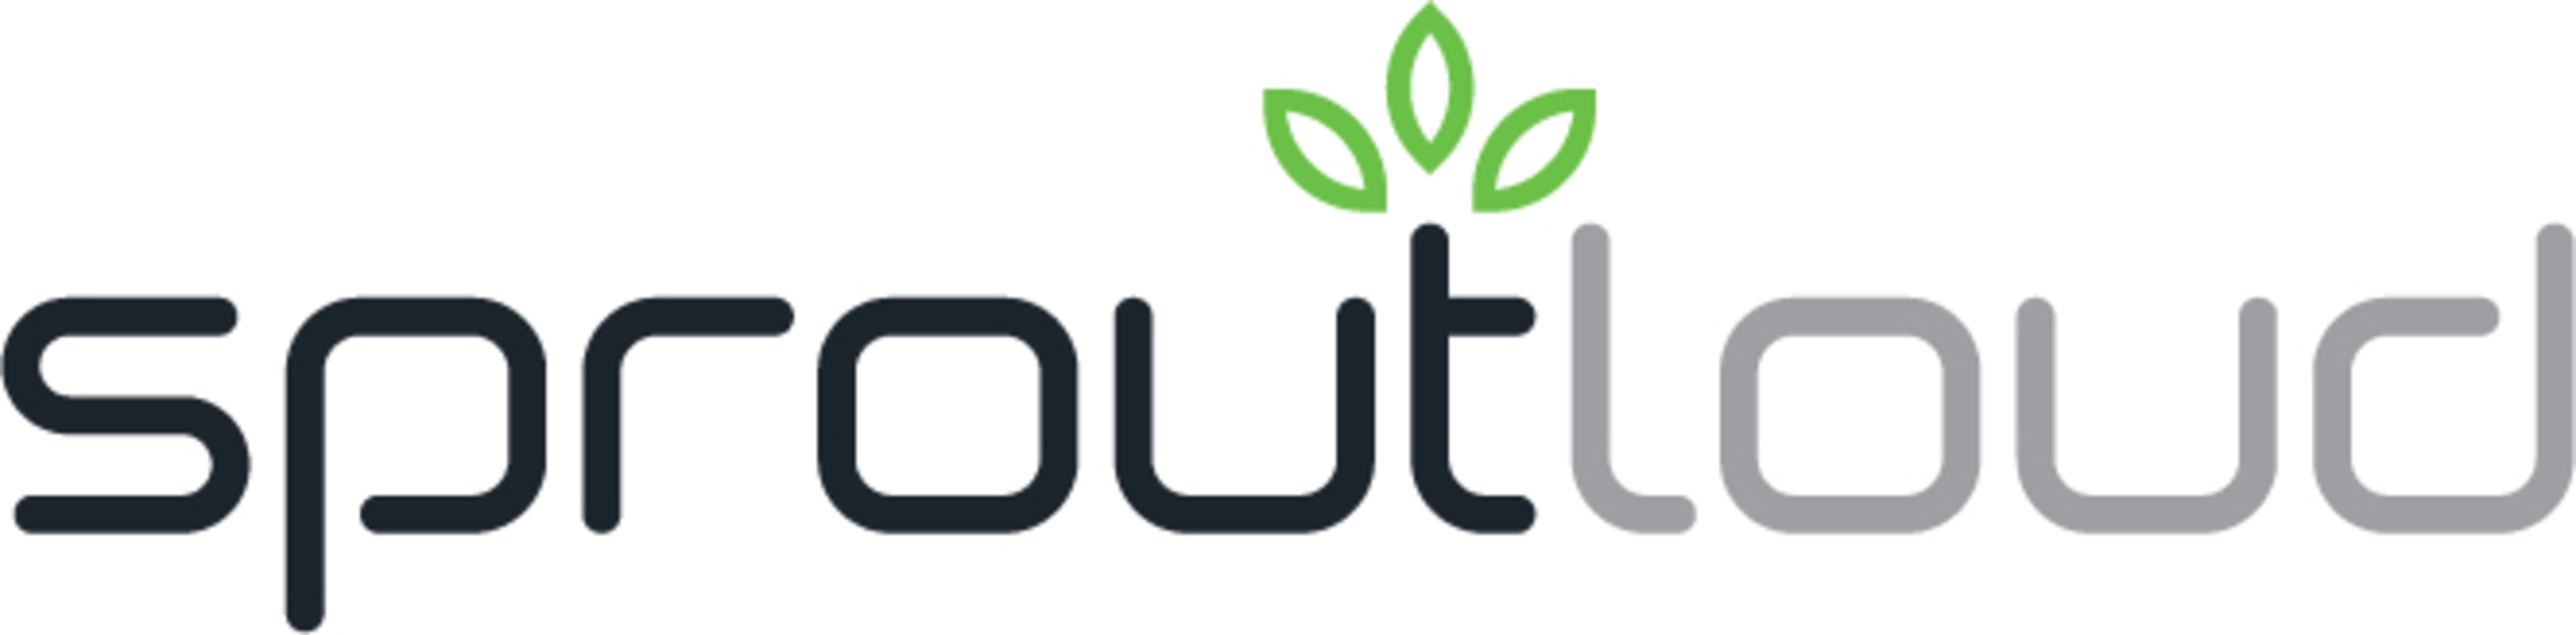 SproutLoud Logo (PRNewsFoto/SproutLoud)